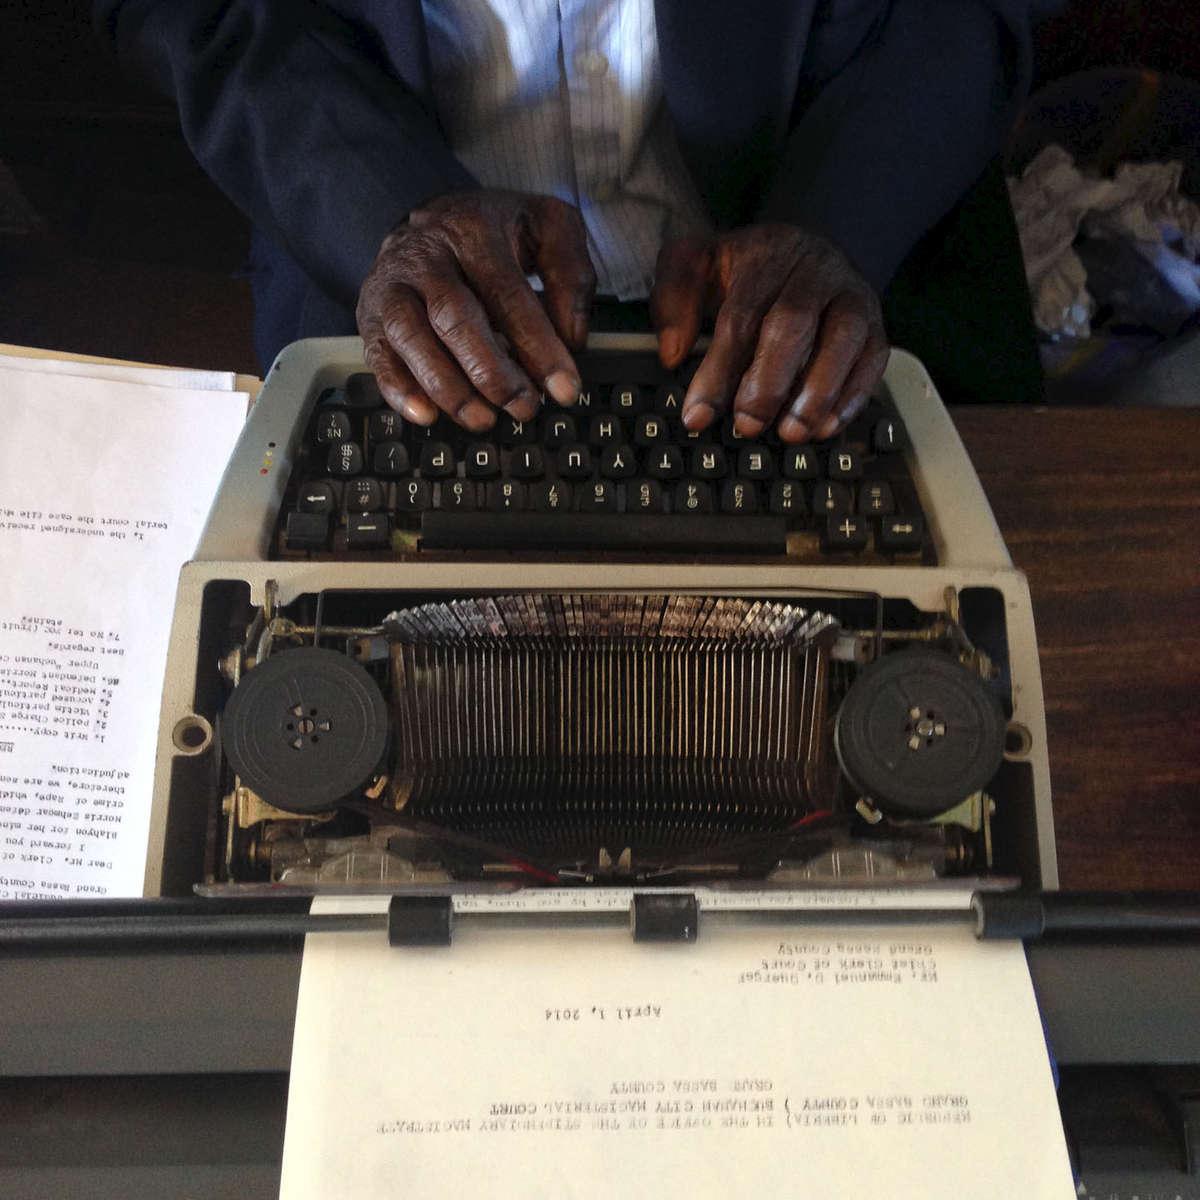 A court typewriter. Buchanan, Liberia. April 2014.